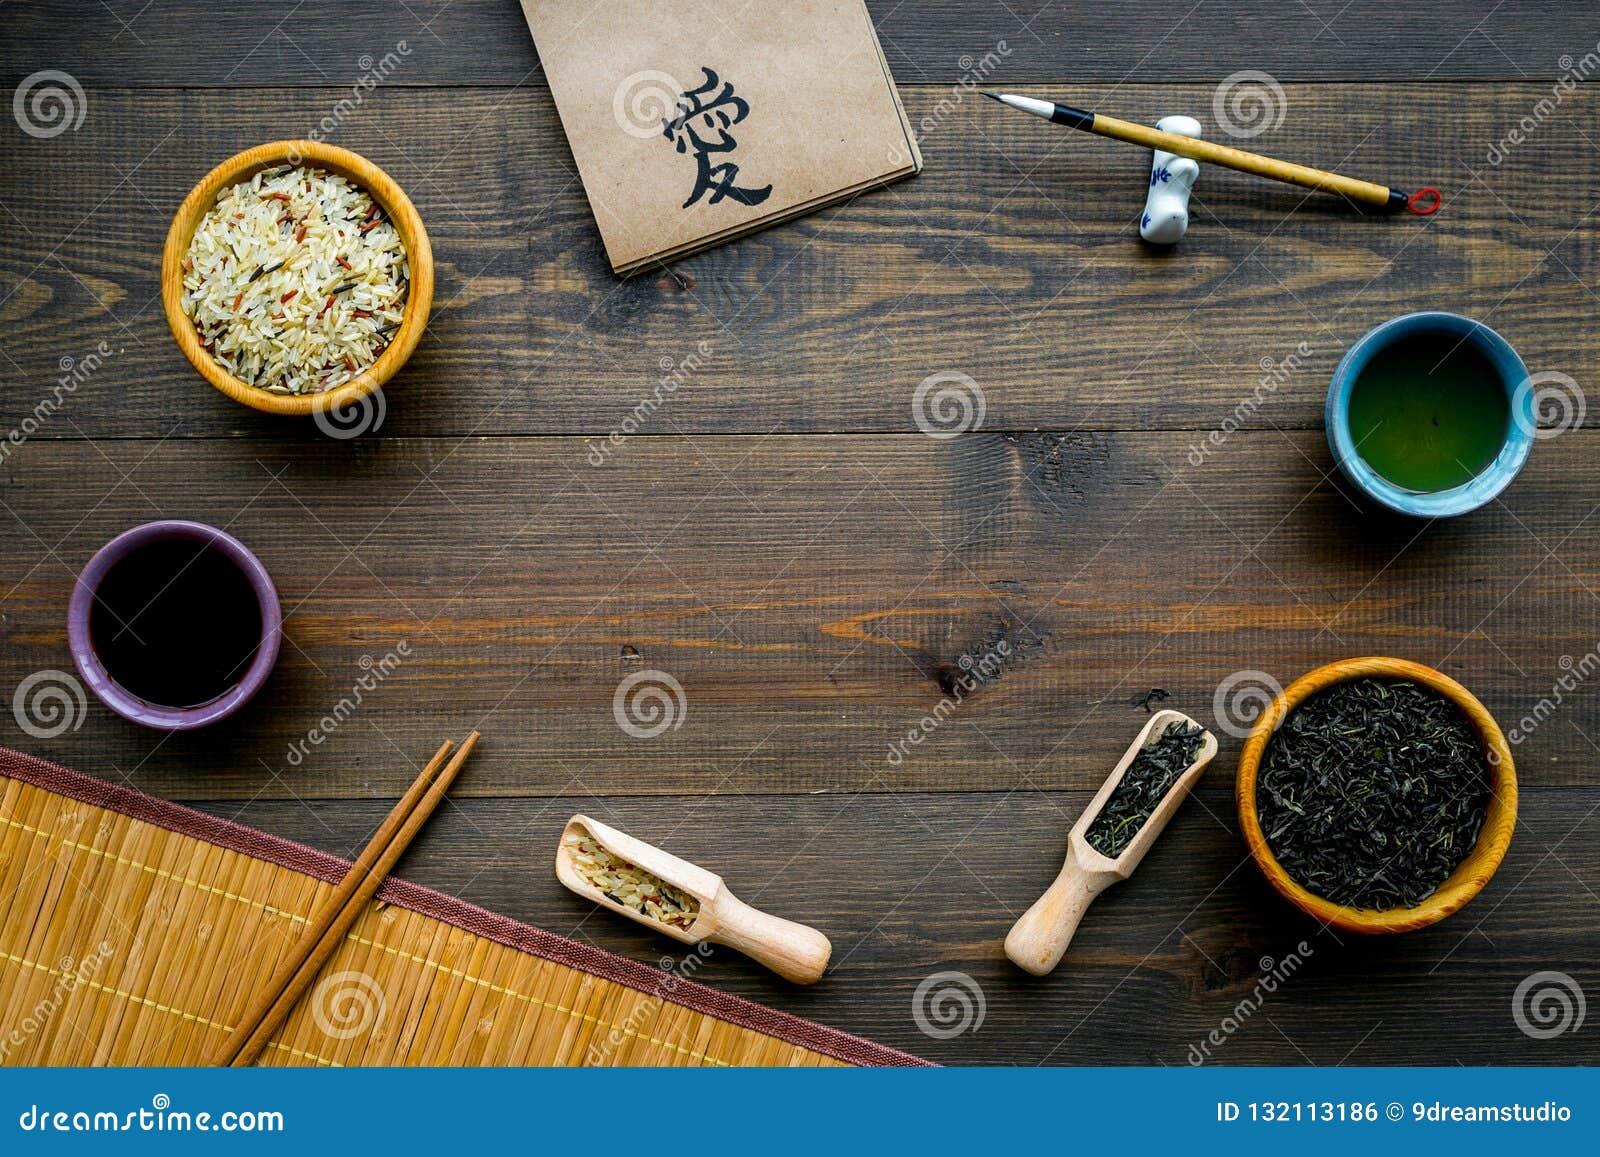 Chinese traditional symbols concept. Tea, rice, hieroglyph symbol, bambootabe mat, chopsticks, soy sause on dark wooden